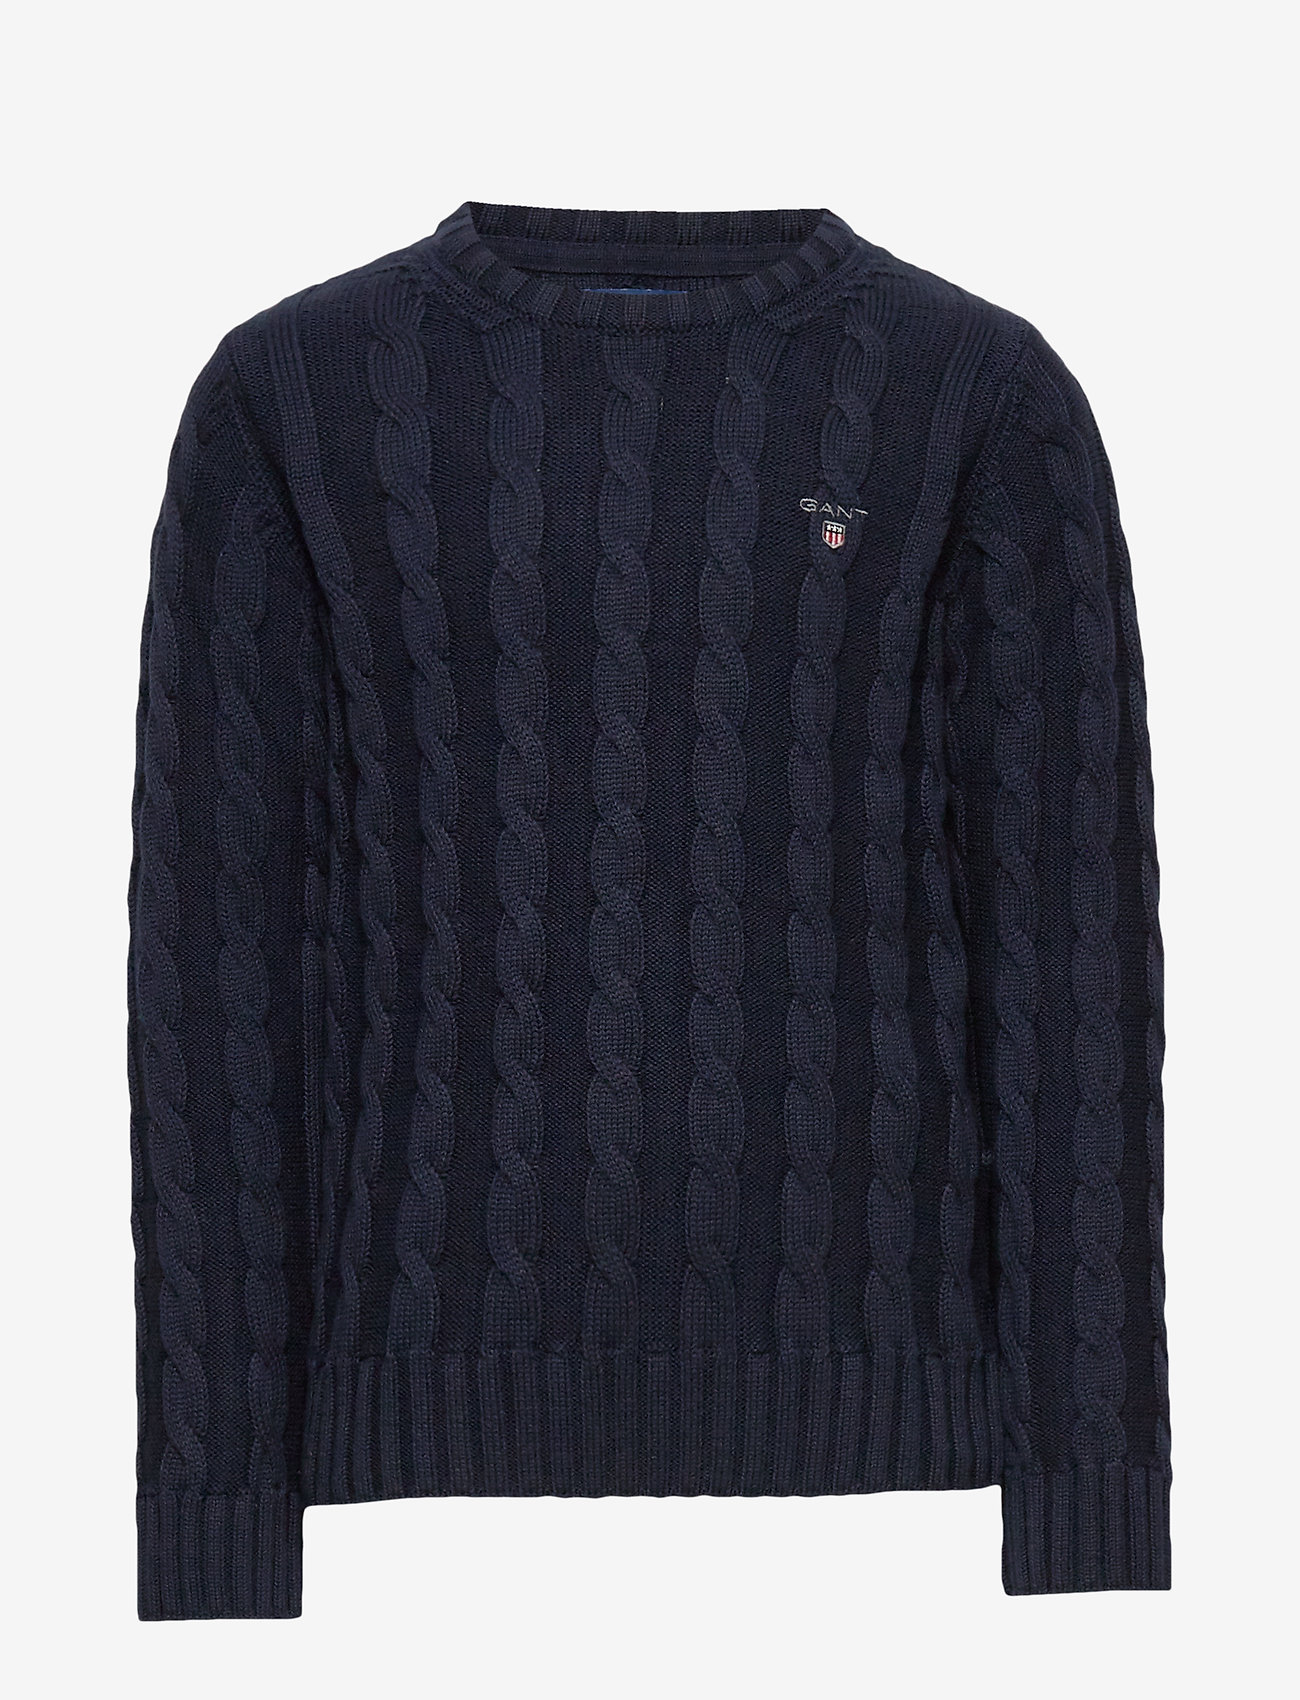 GANT - COTTON CABLE CREW - strickmode - evening blue - 0